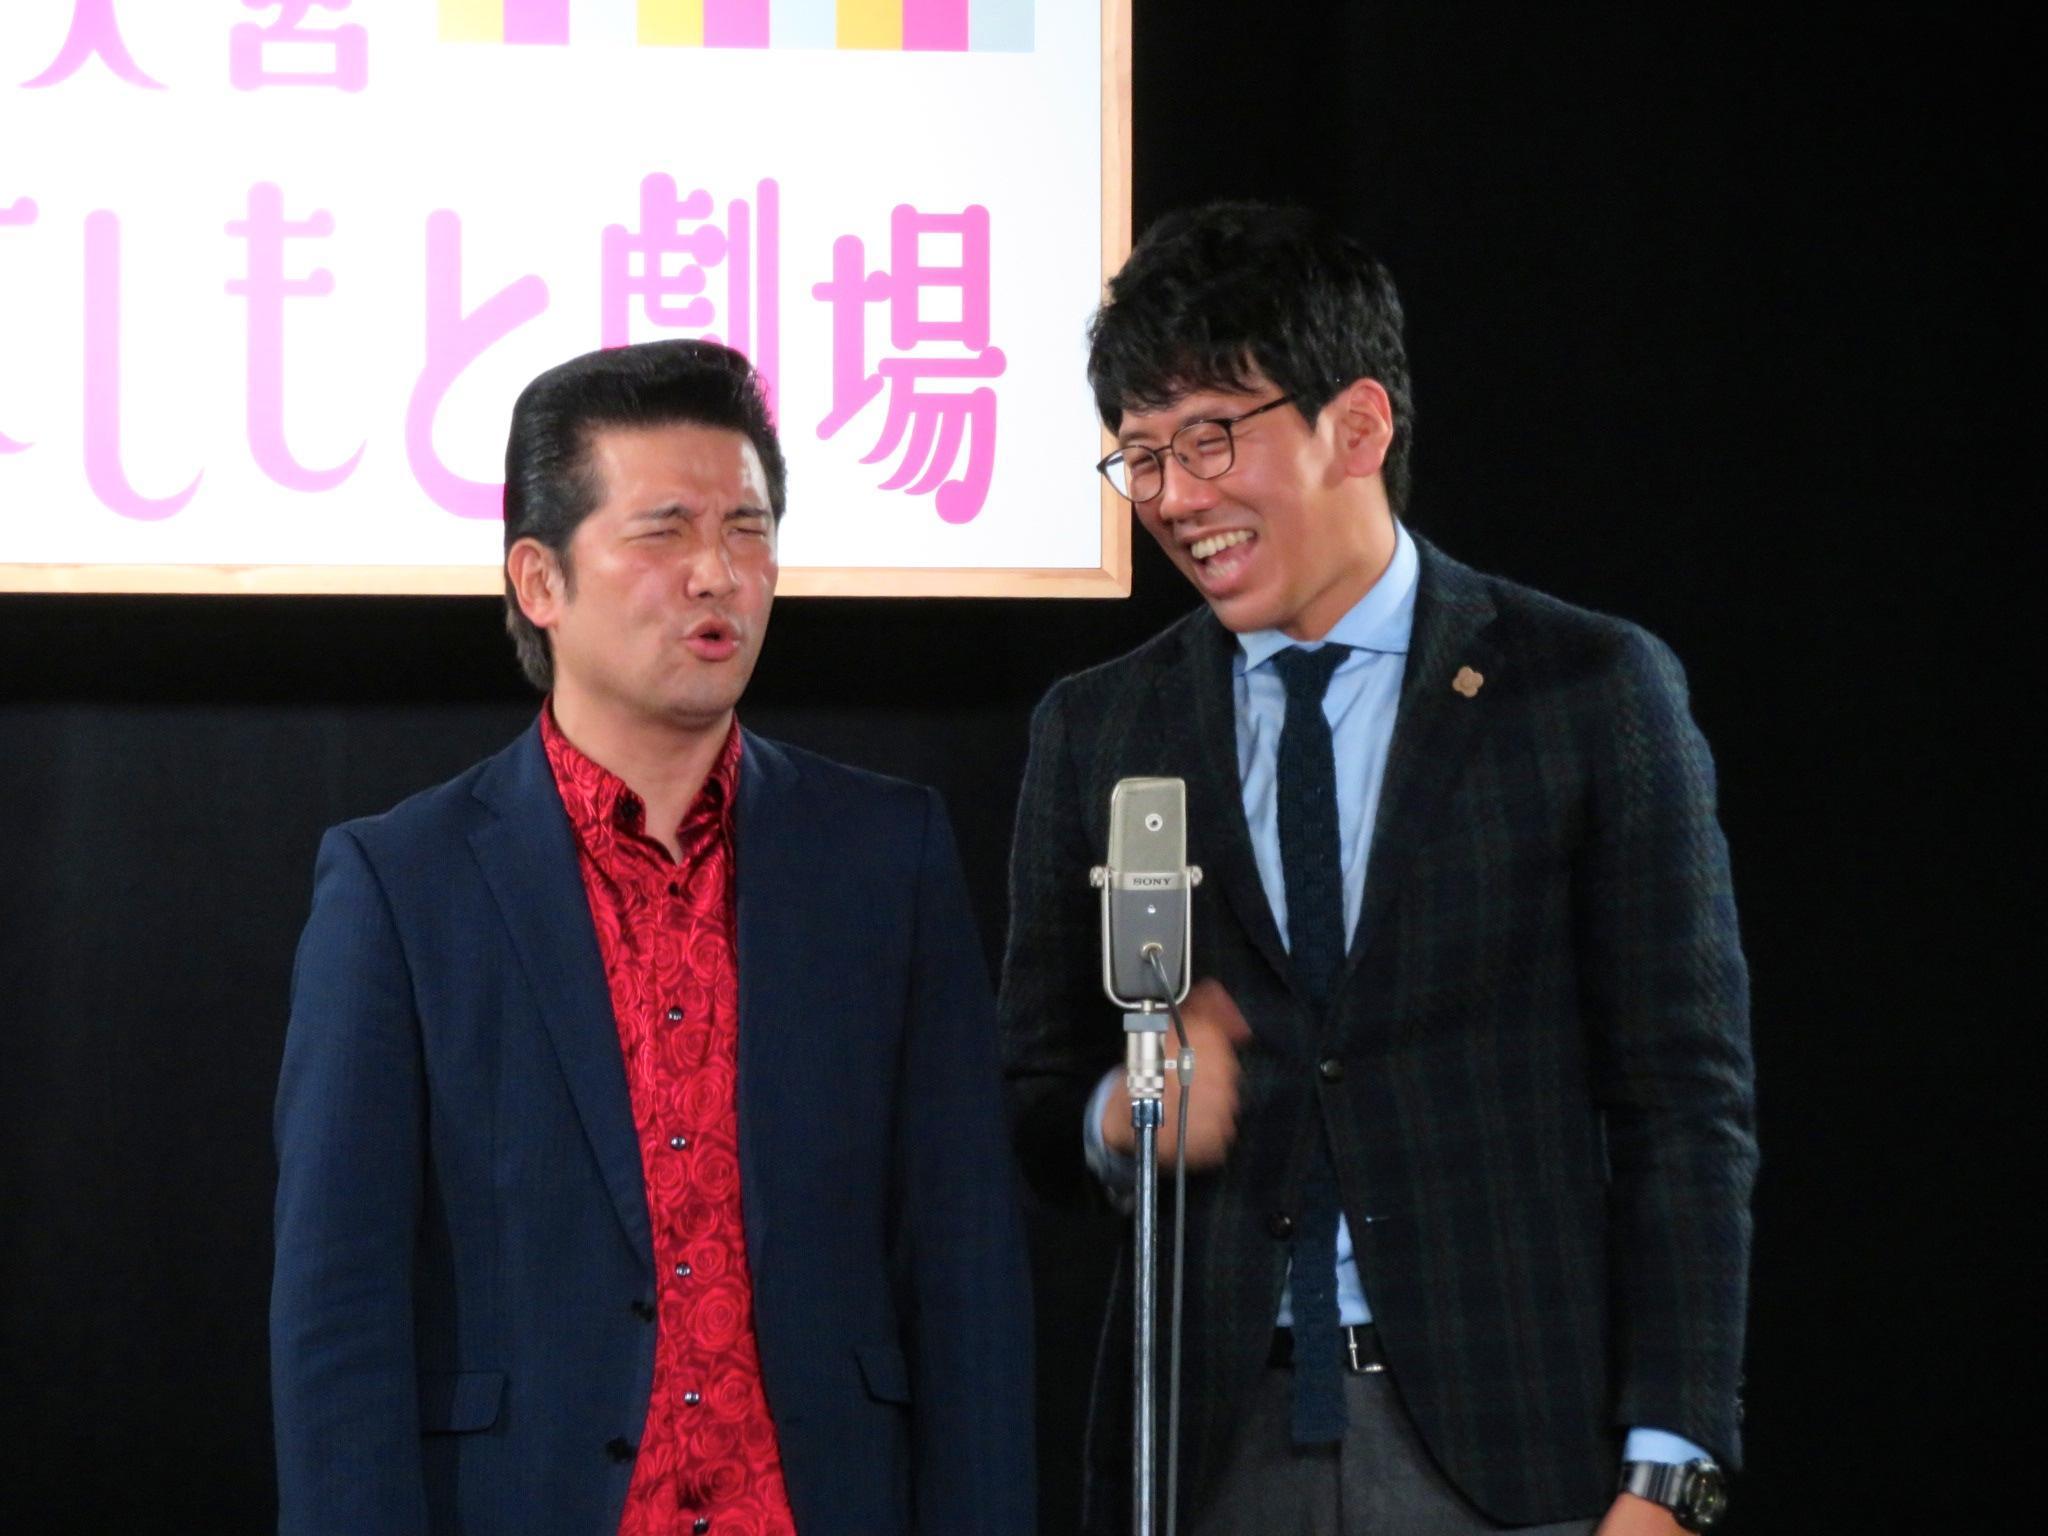 http://news.yoshimoto.co.jp/20171230223258-fcd98a7ec39ad405608da19221910cda1af81927.jpg